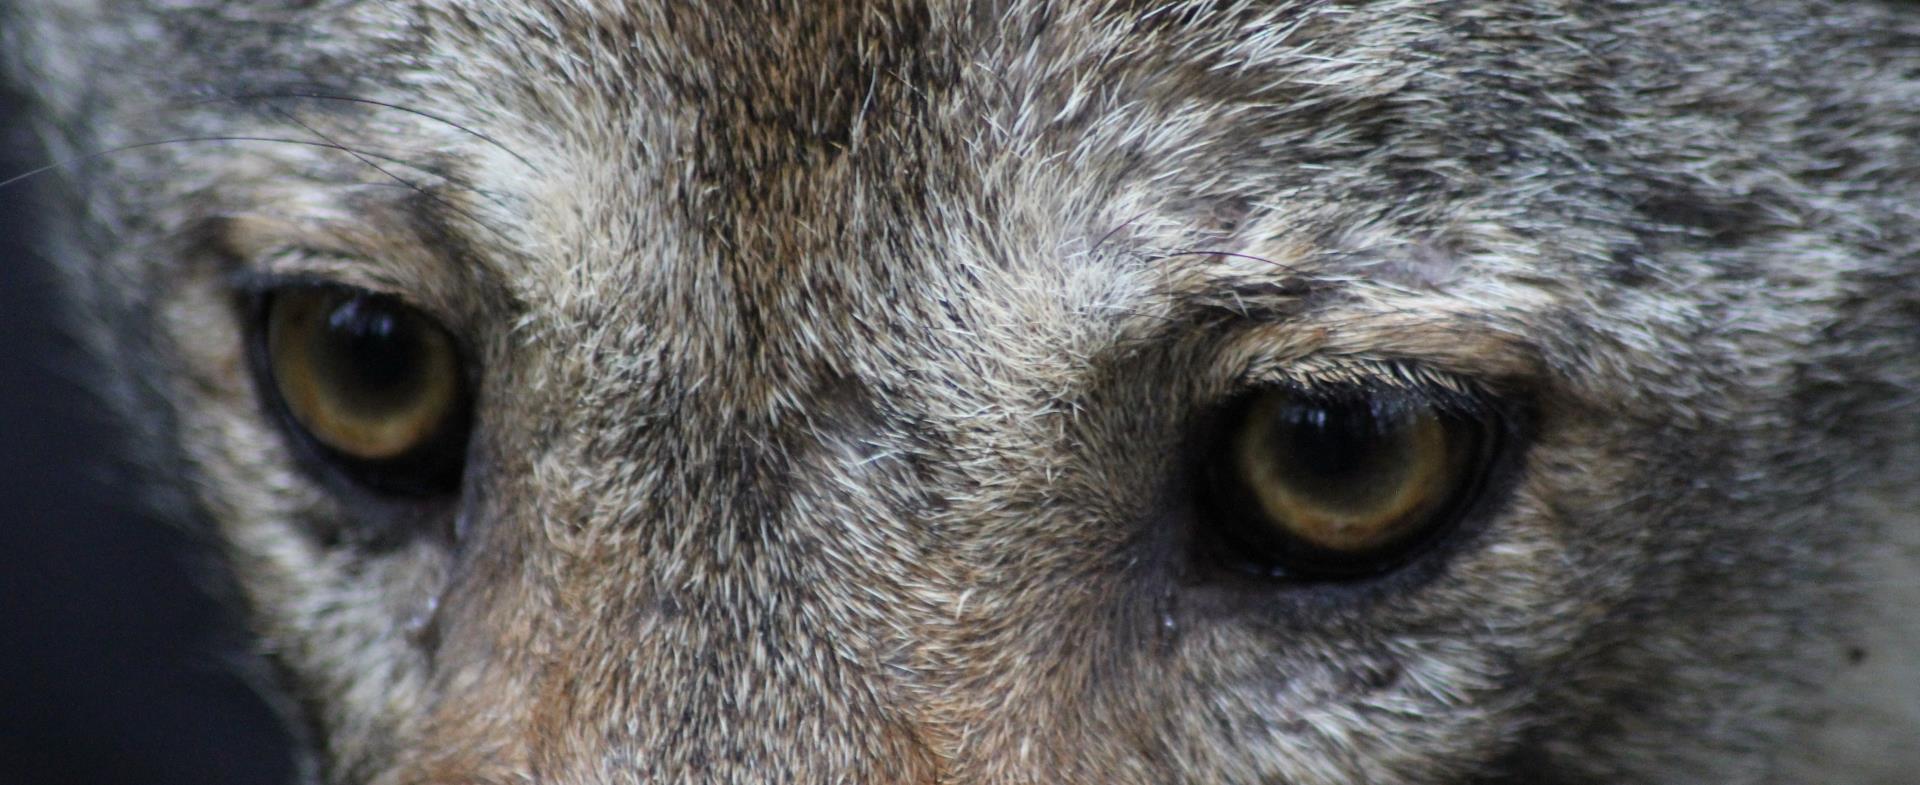 Sur les Traces du Loup - Sur les Traces du Loup